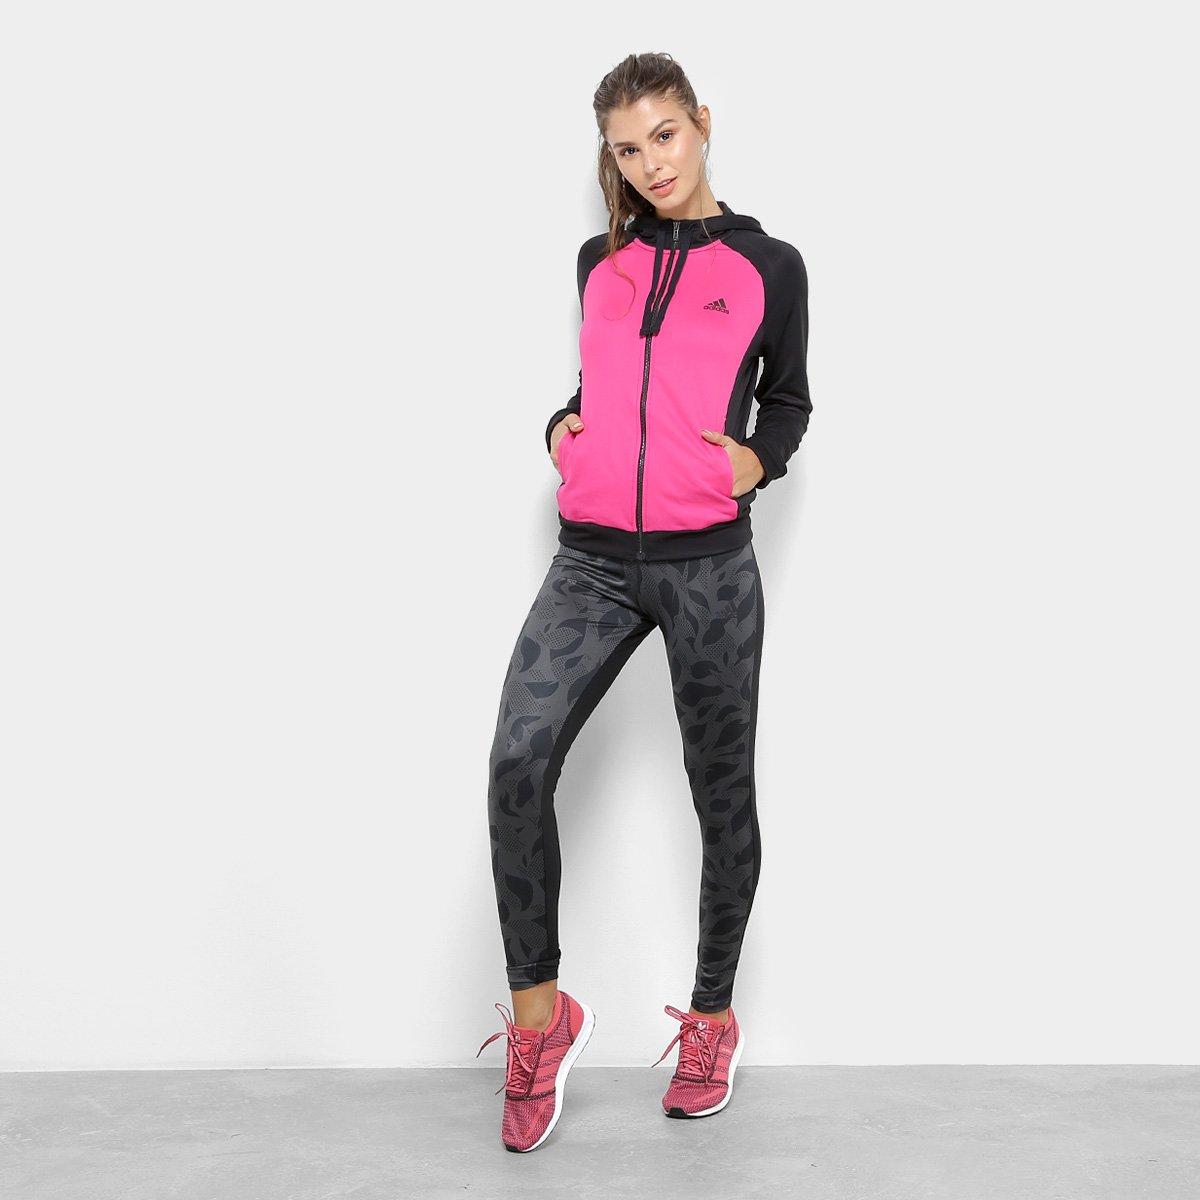 1ba5fc9e9d3 Agasalho Adidas Wts Hoodytight Feminino - Compre Agora